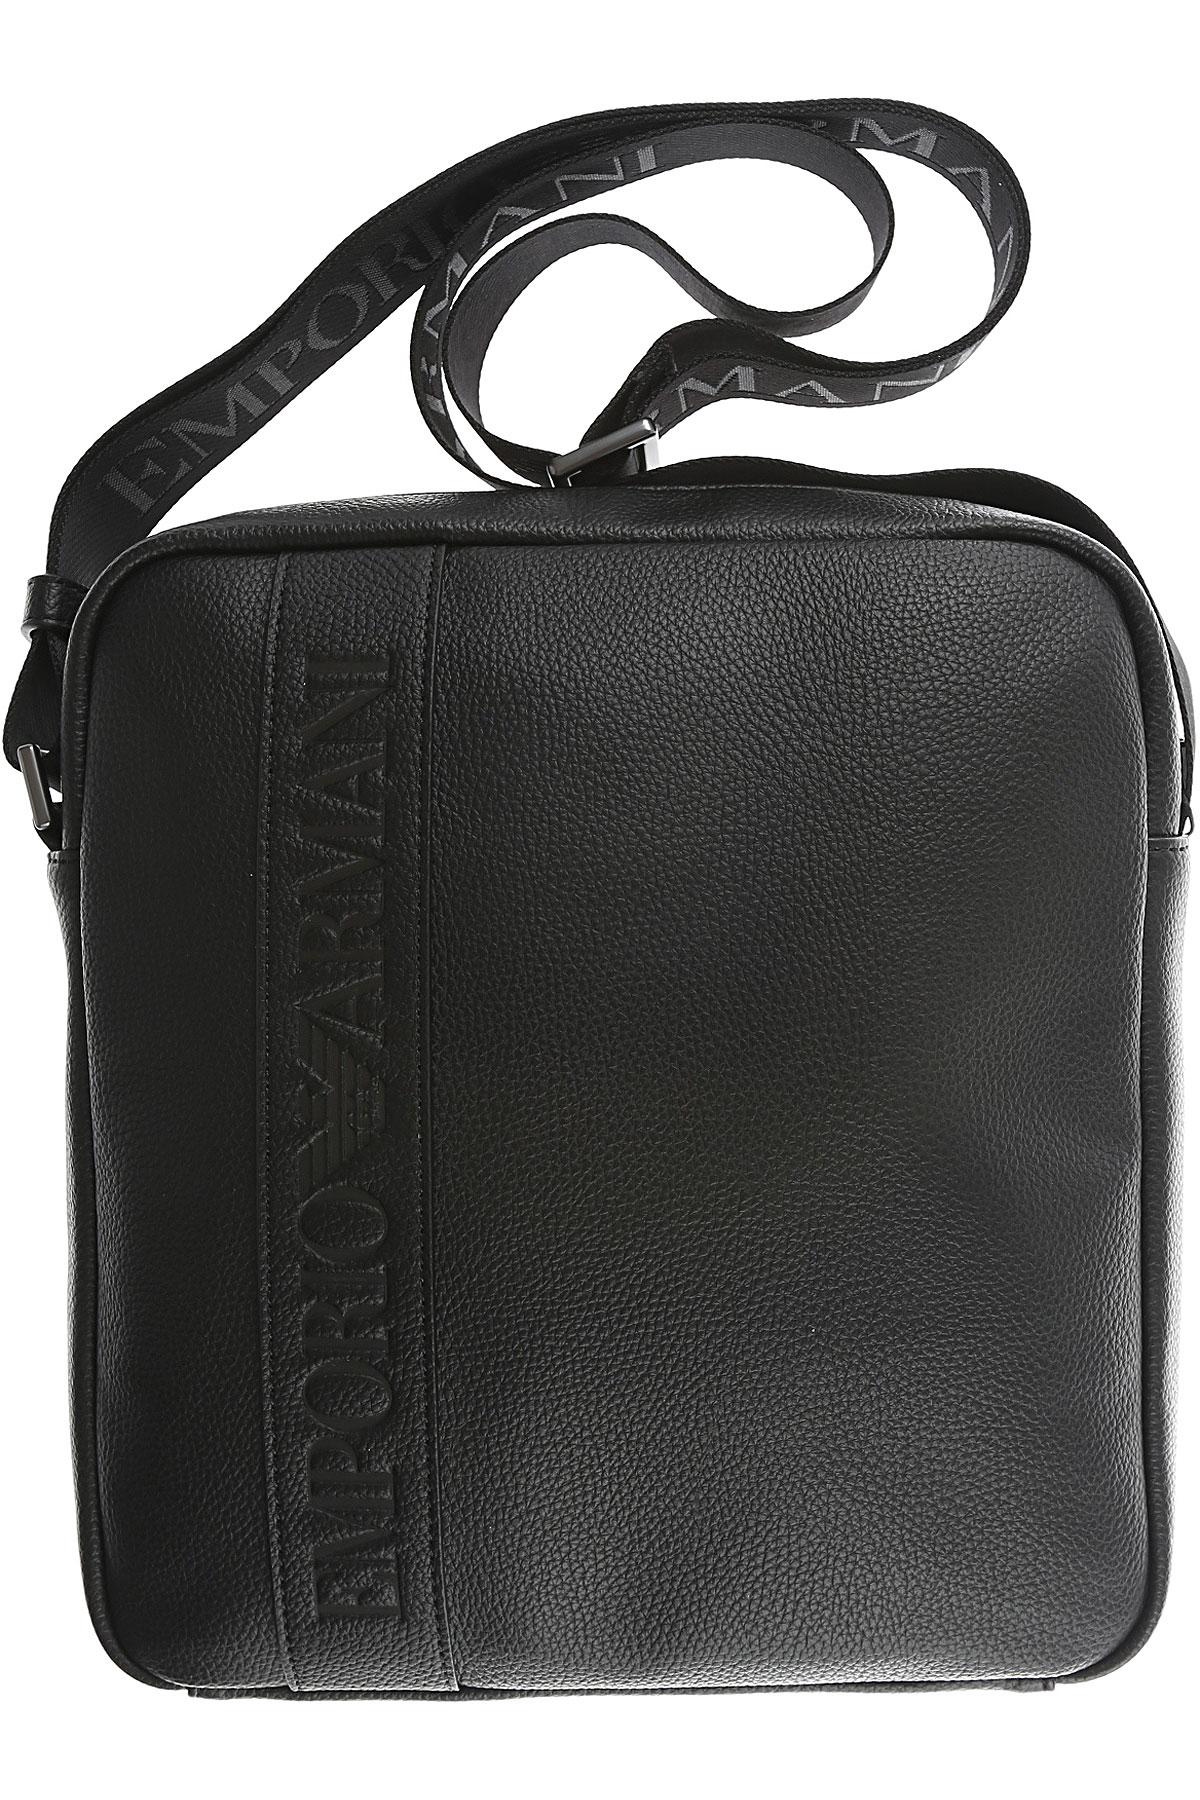 Image of Emporio Armani Messenger Bag for Men, Black, Leather, 2017